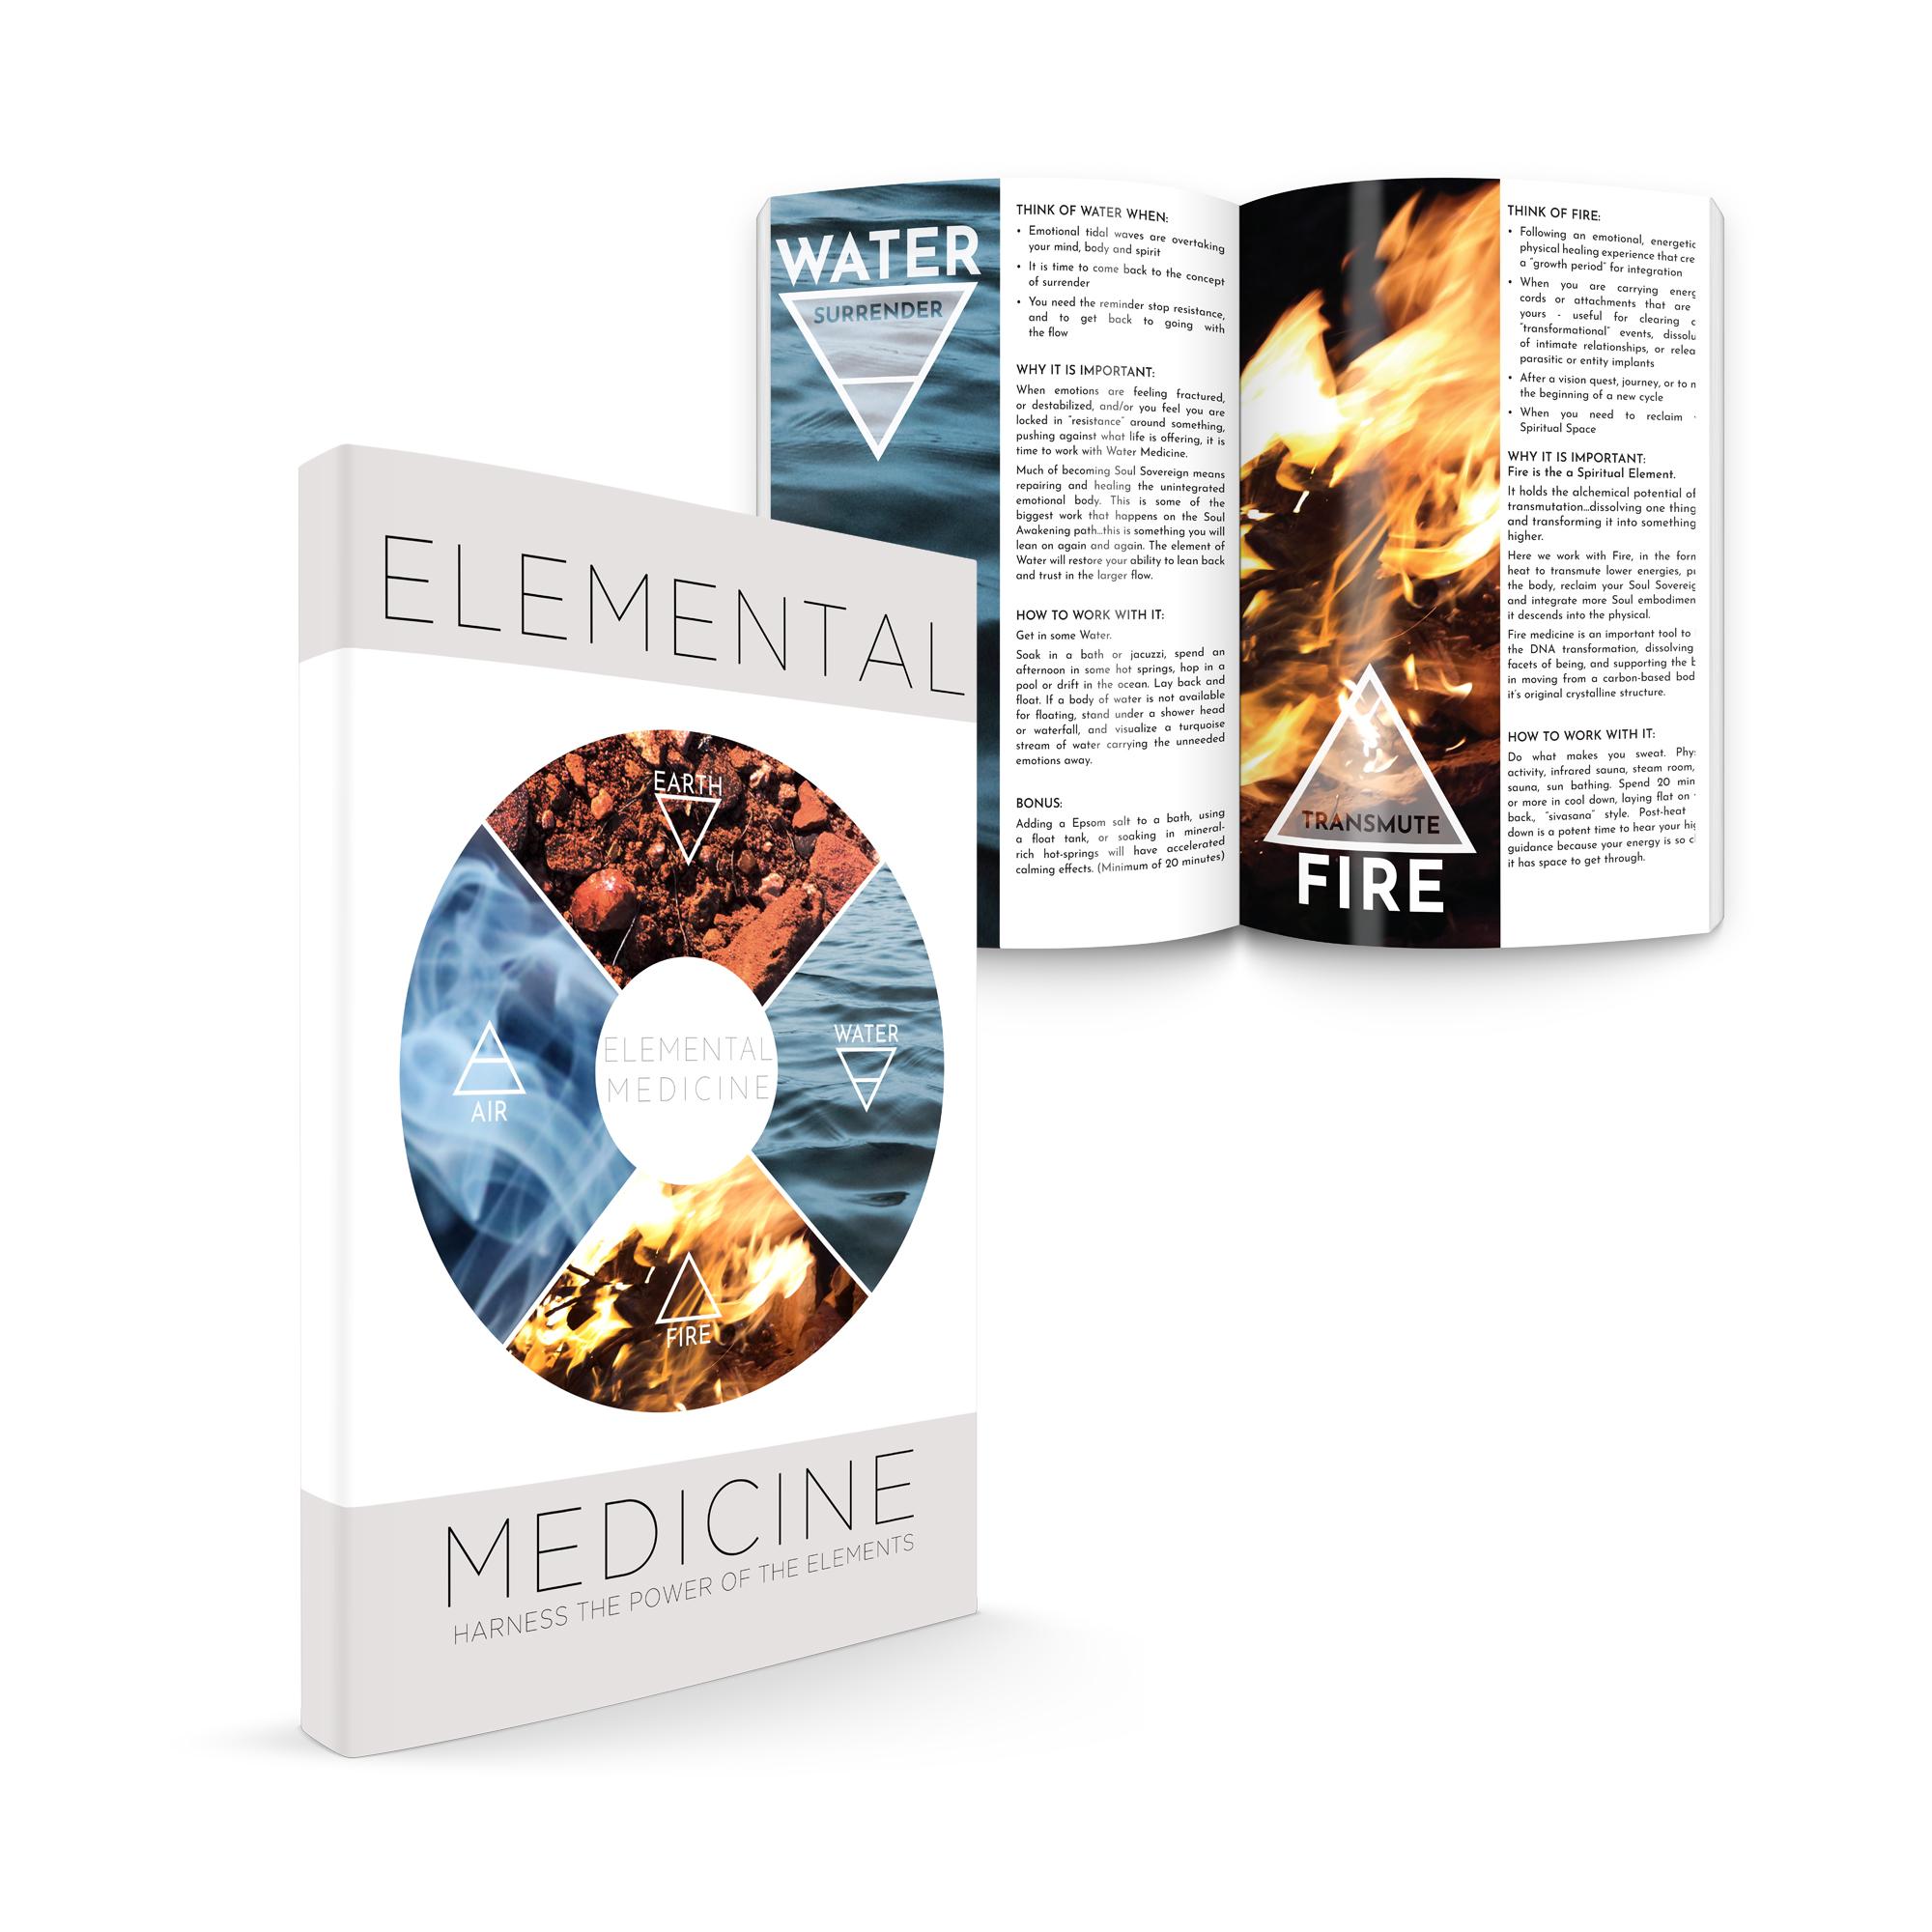 elemental-medicine-mock.jpg